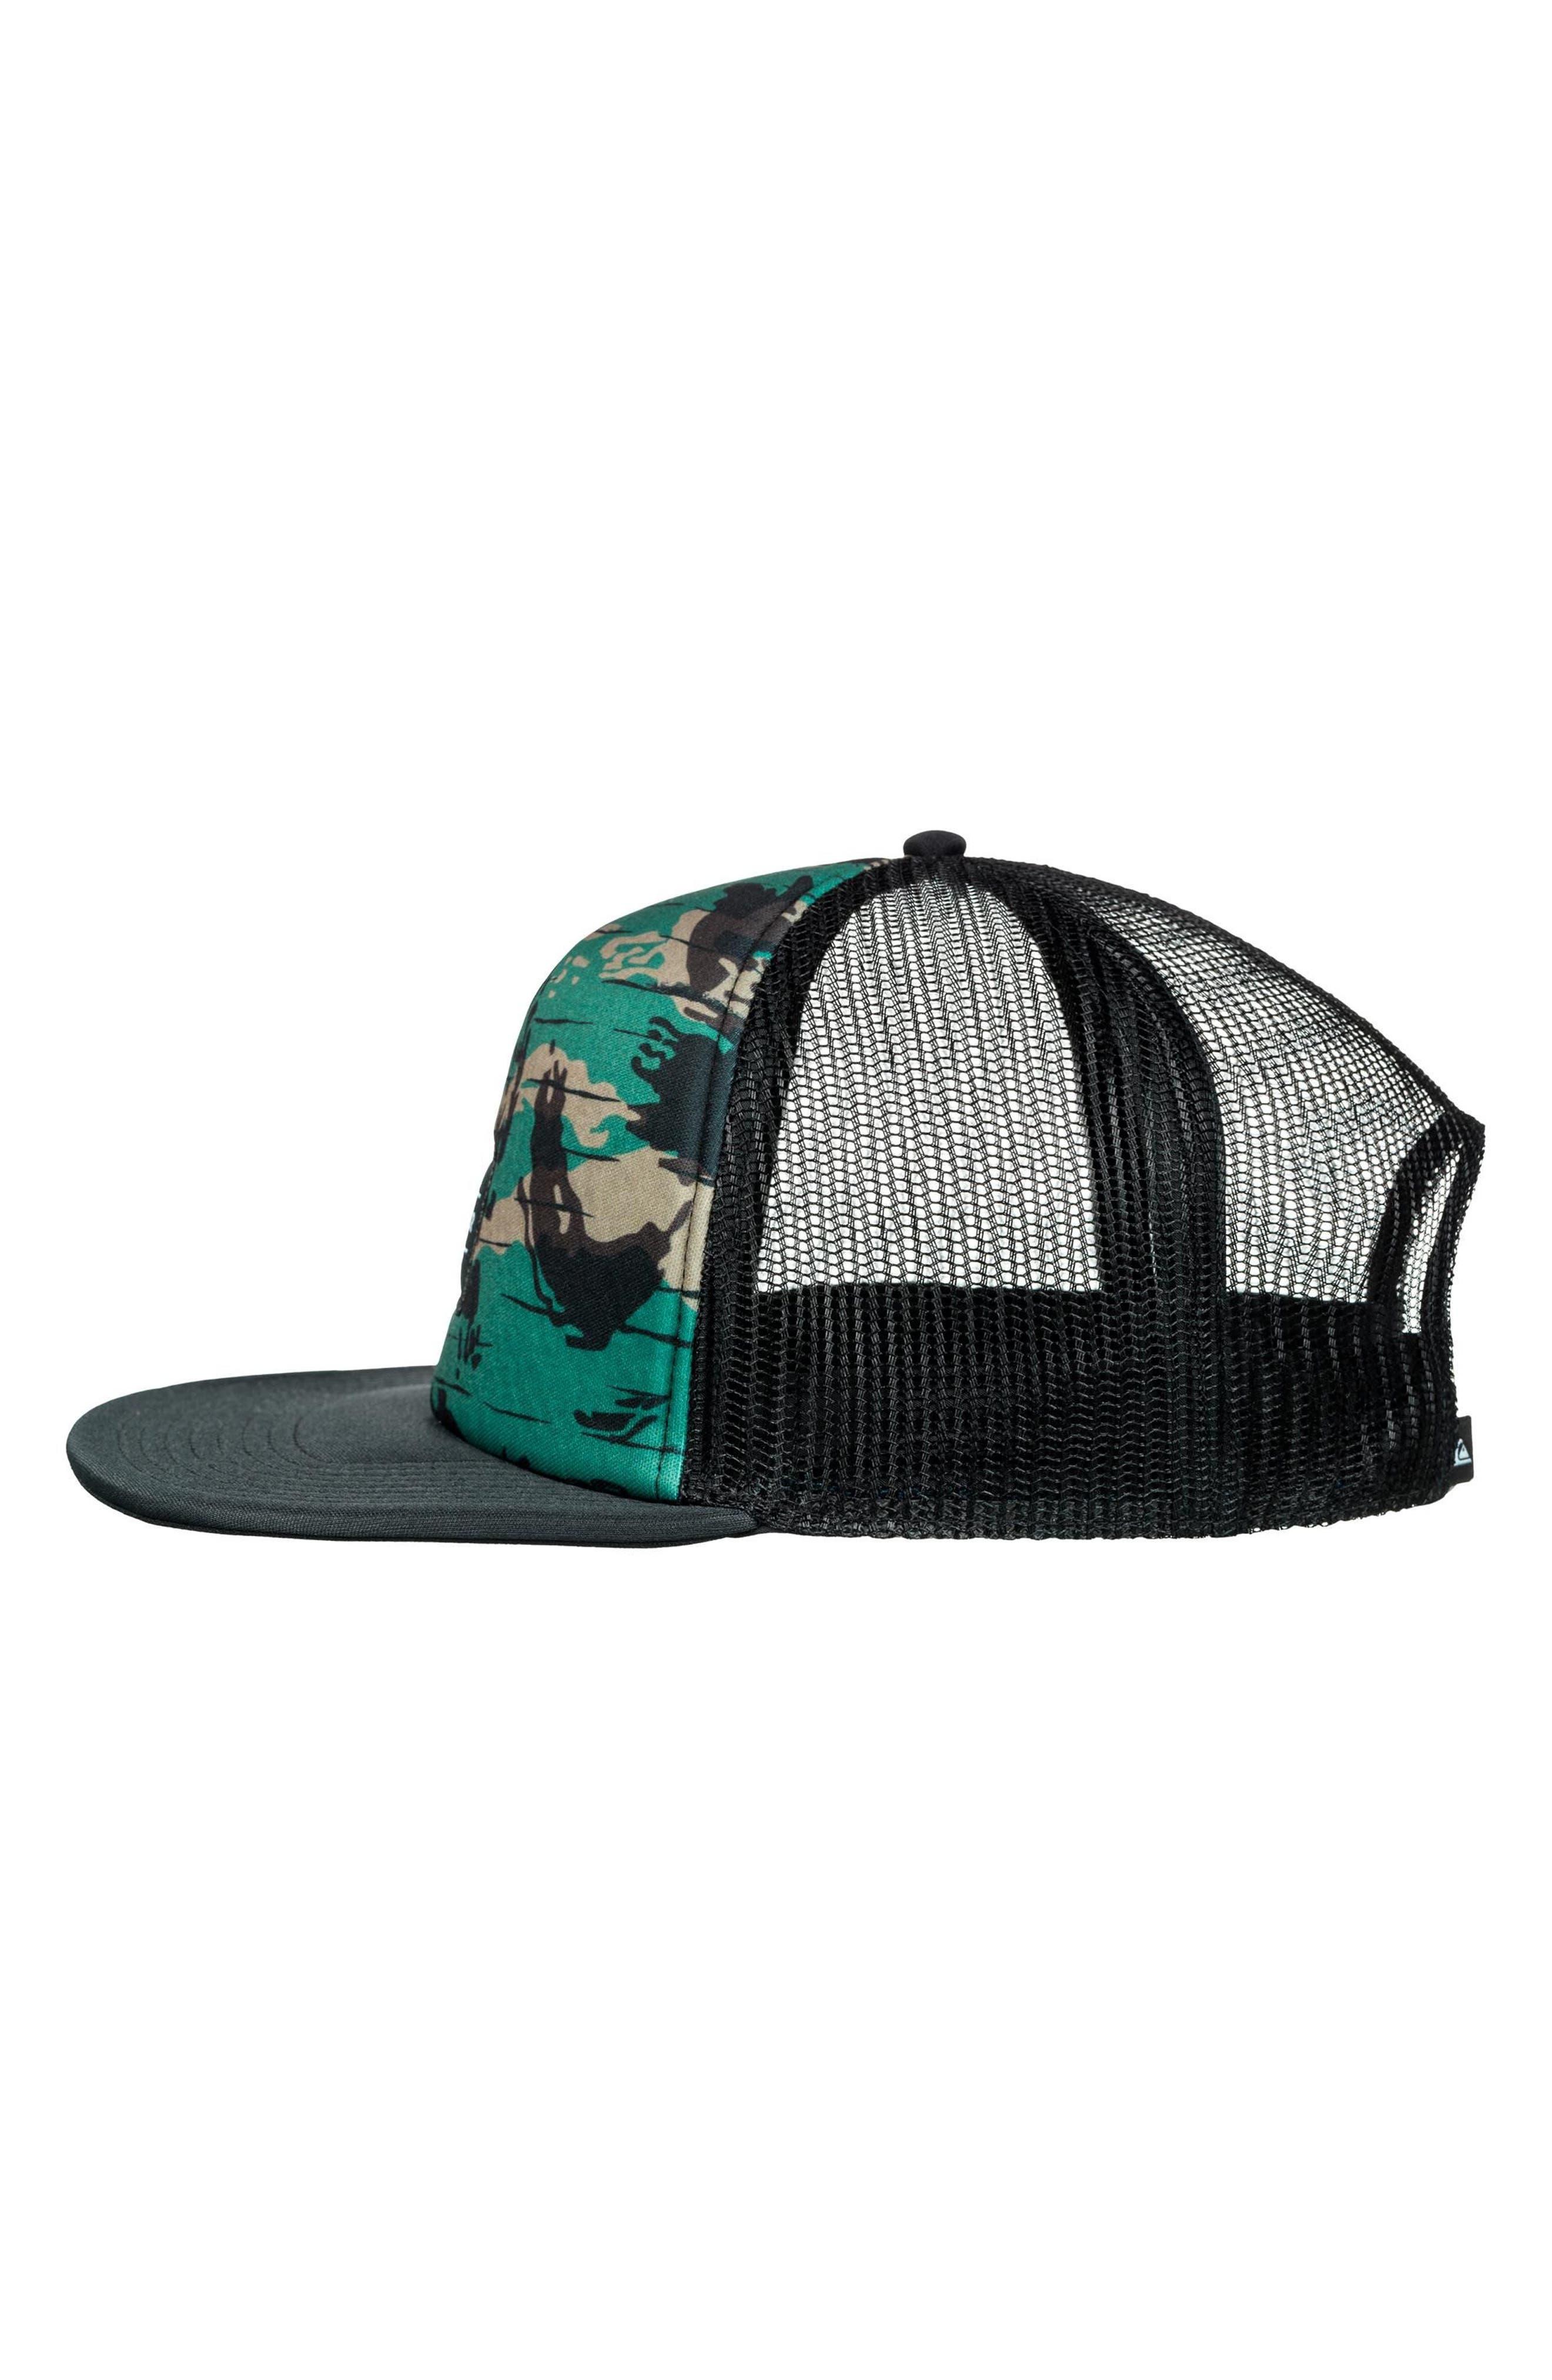 Brissells Trucker Hat,                             Alternate thumbnail 4, color,